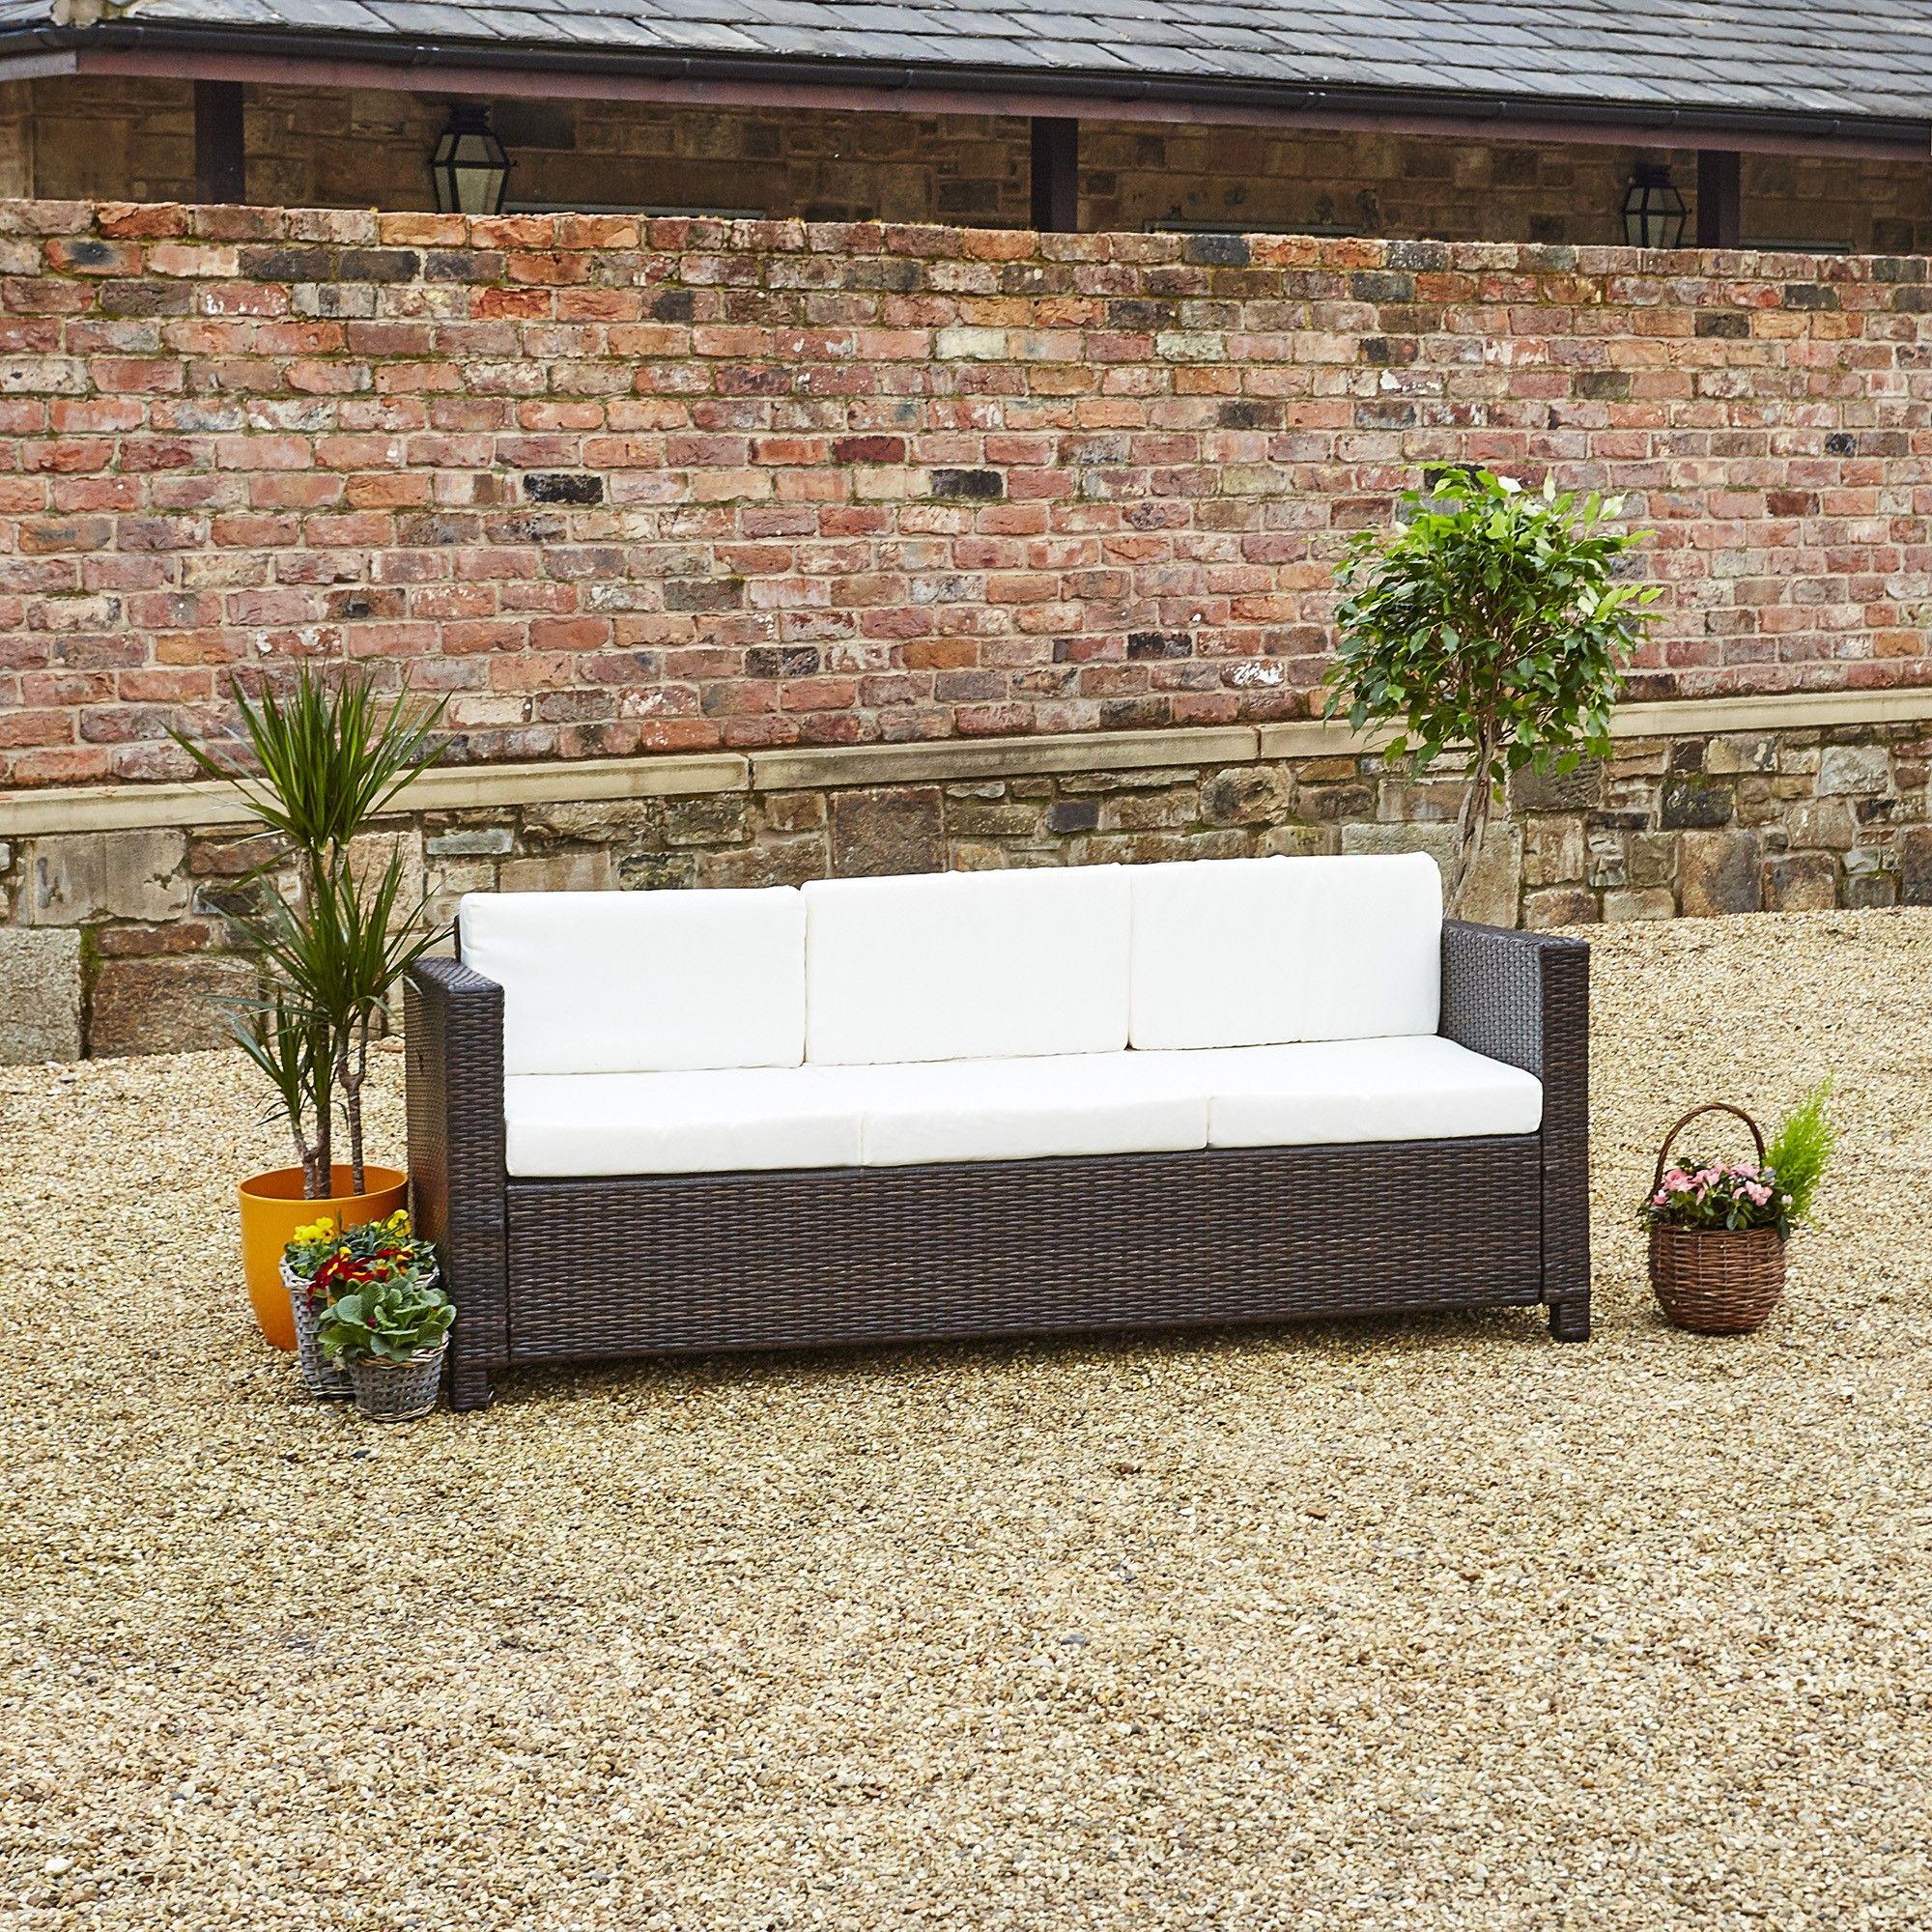 Rattan Garden Furniture From Abreo Brown Rattan Sofa Rattan